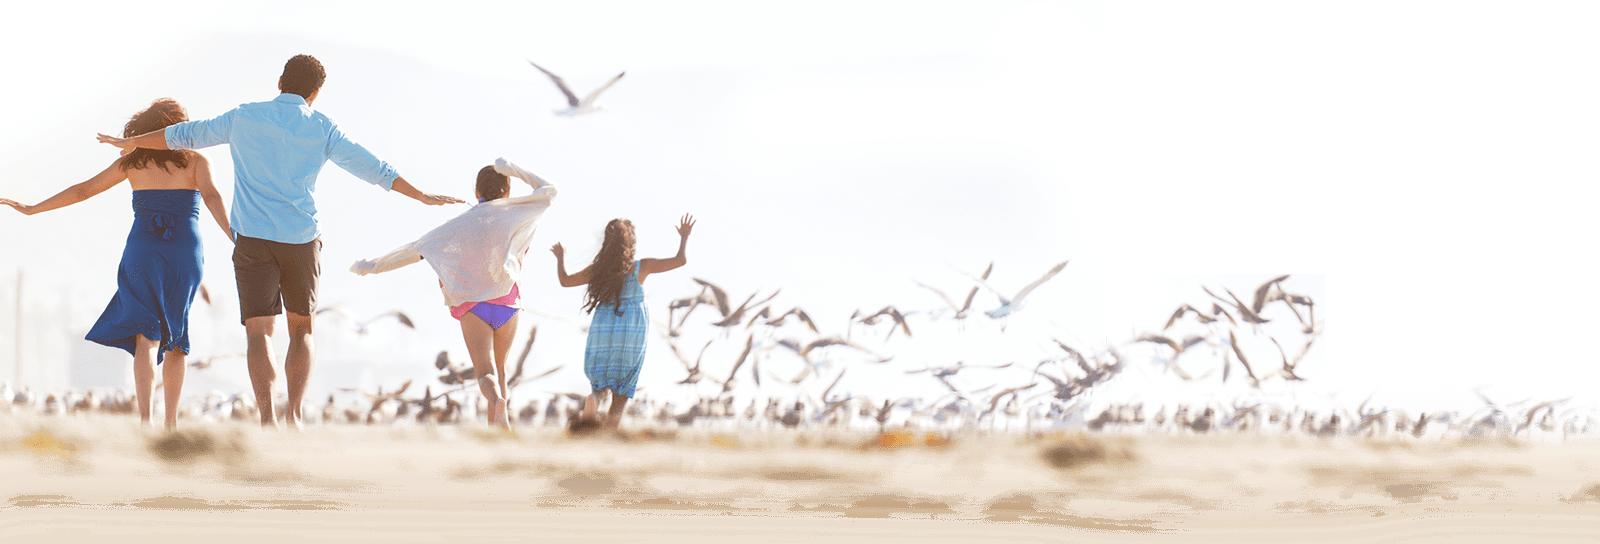 Seagulls Flocking to the family